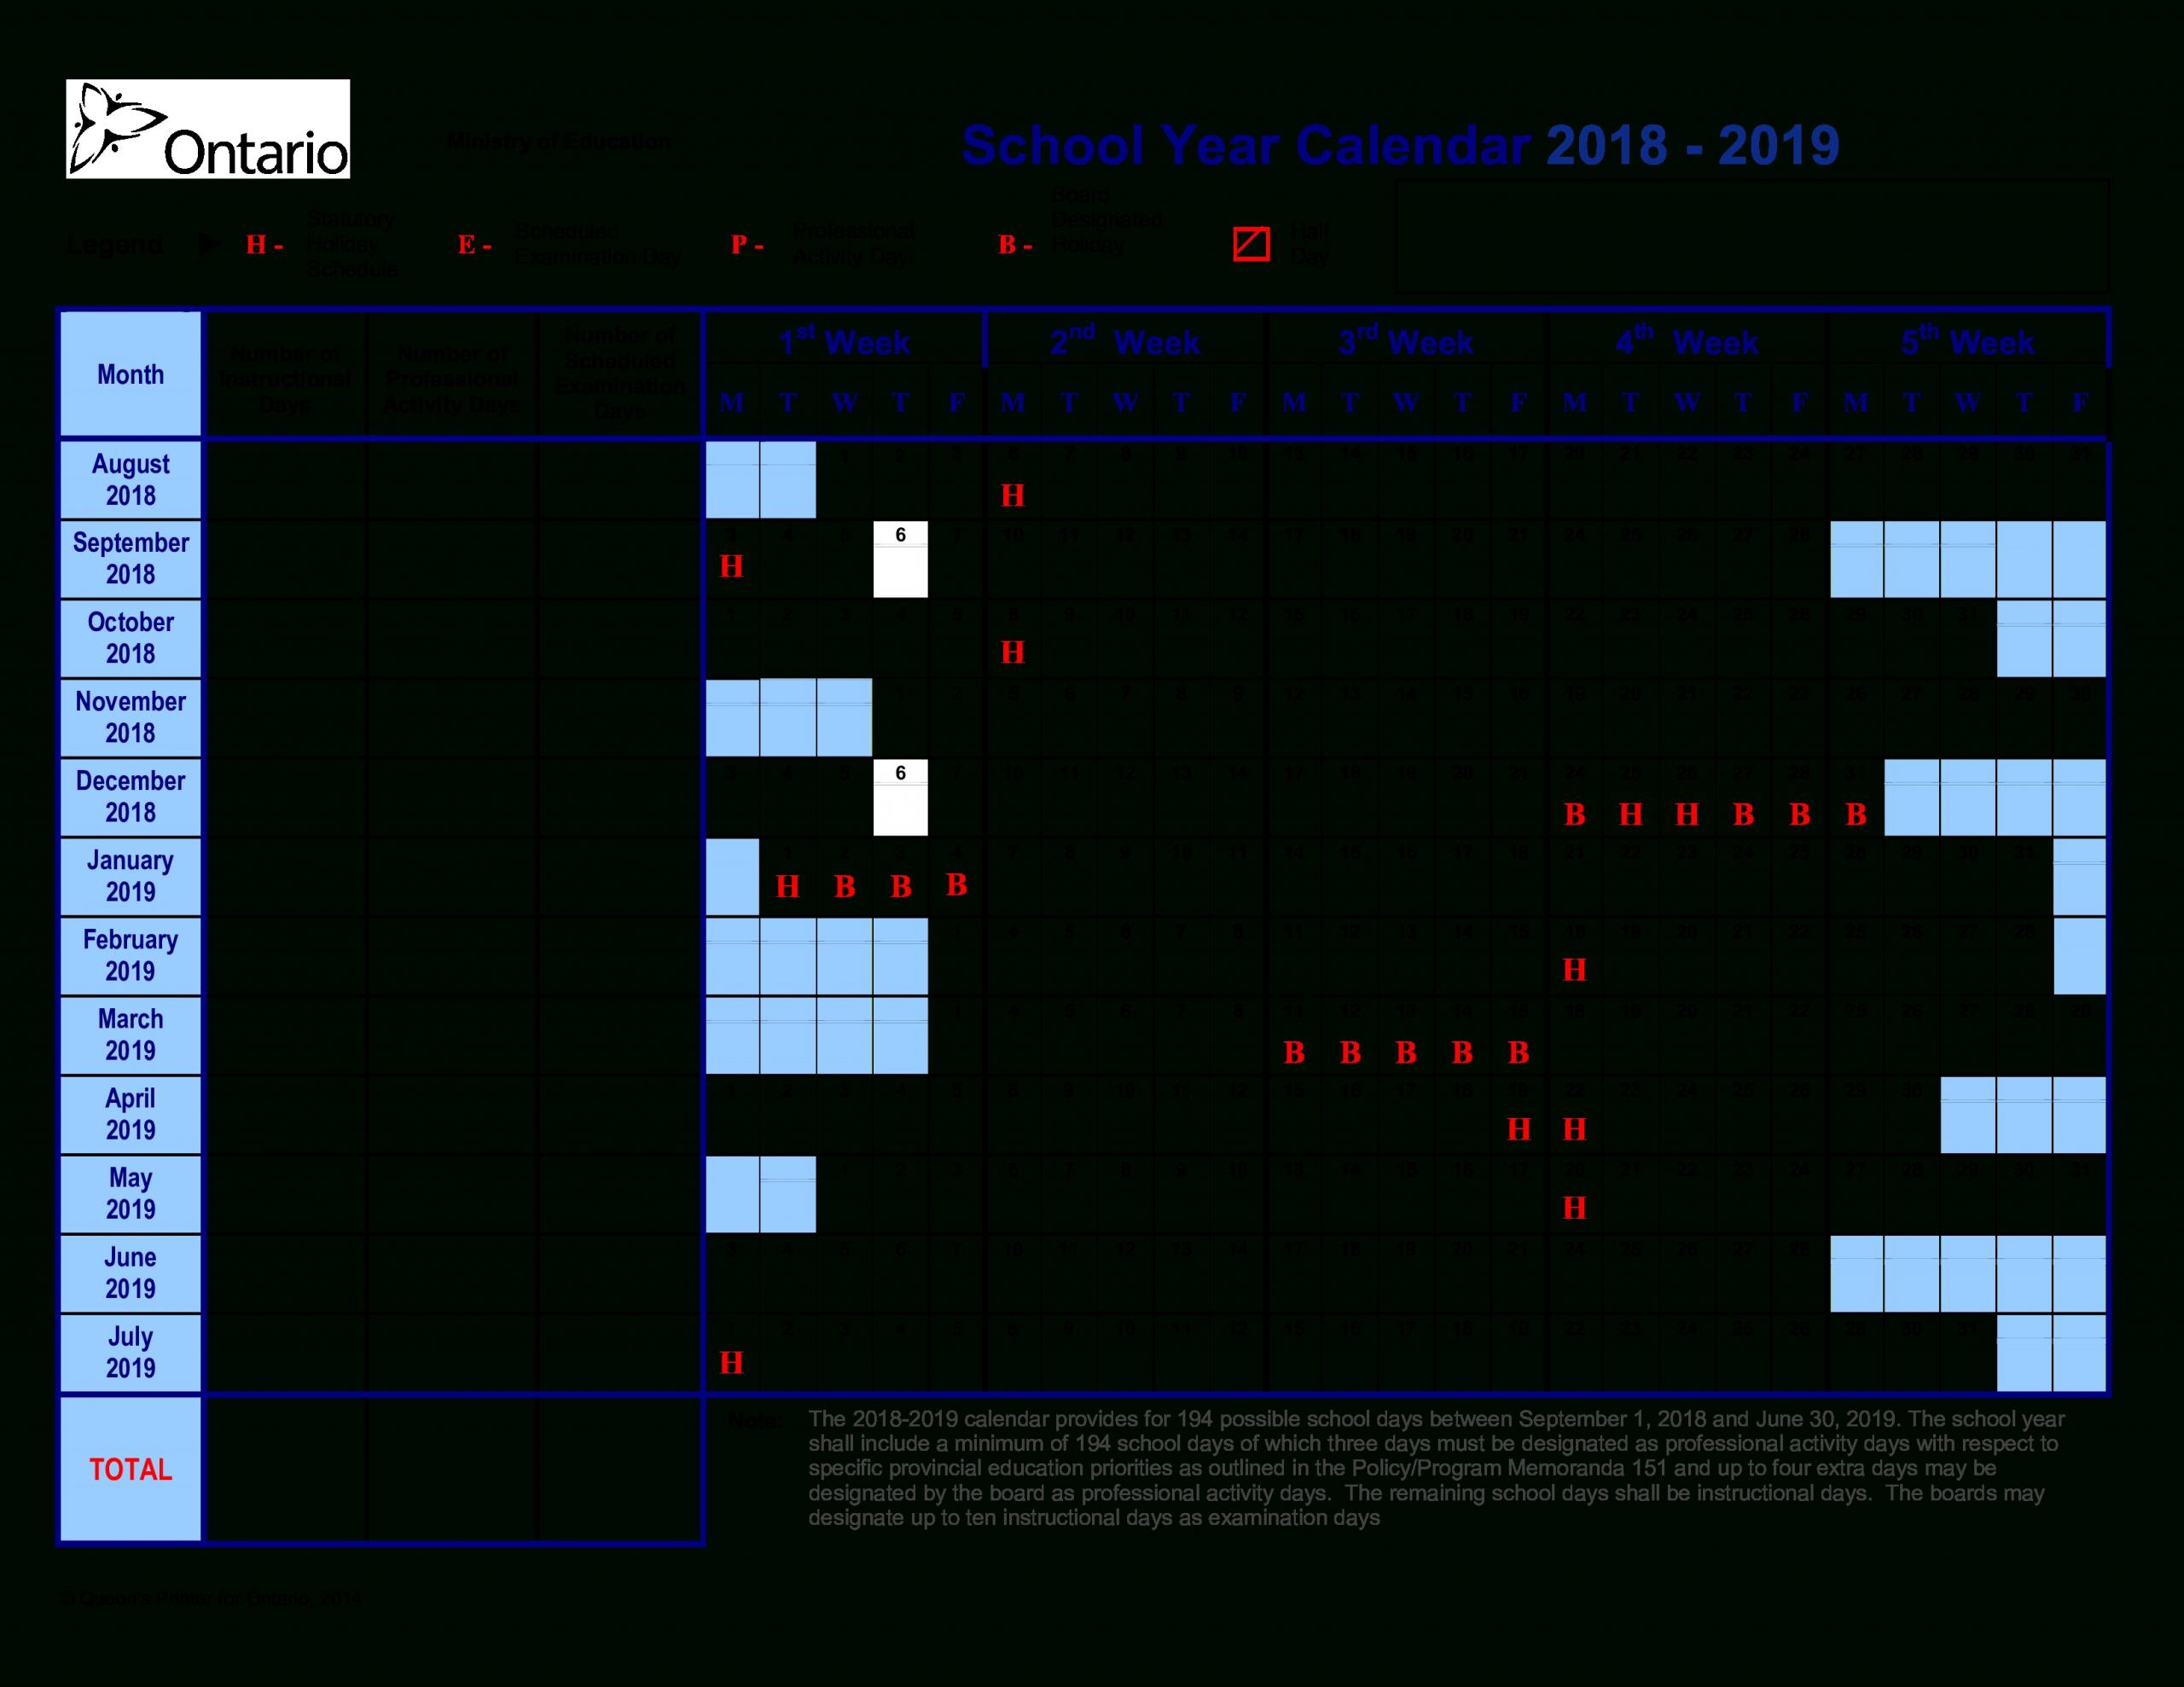 School Year Training Calendar 2018-2019 | Templates At